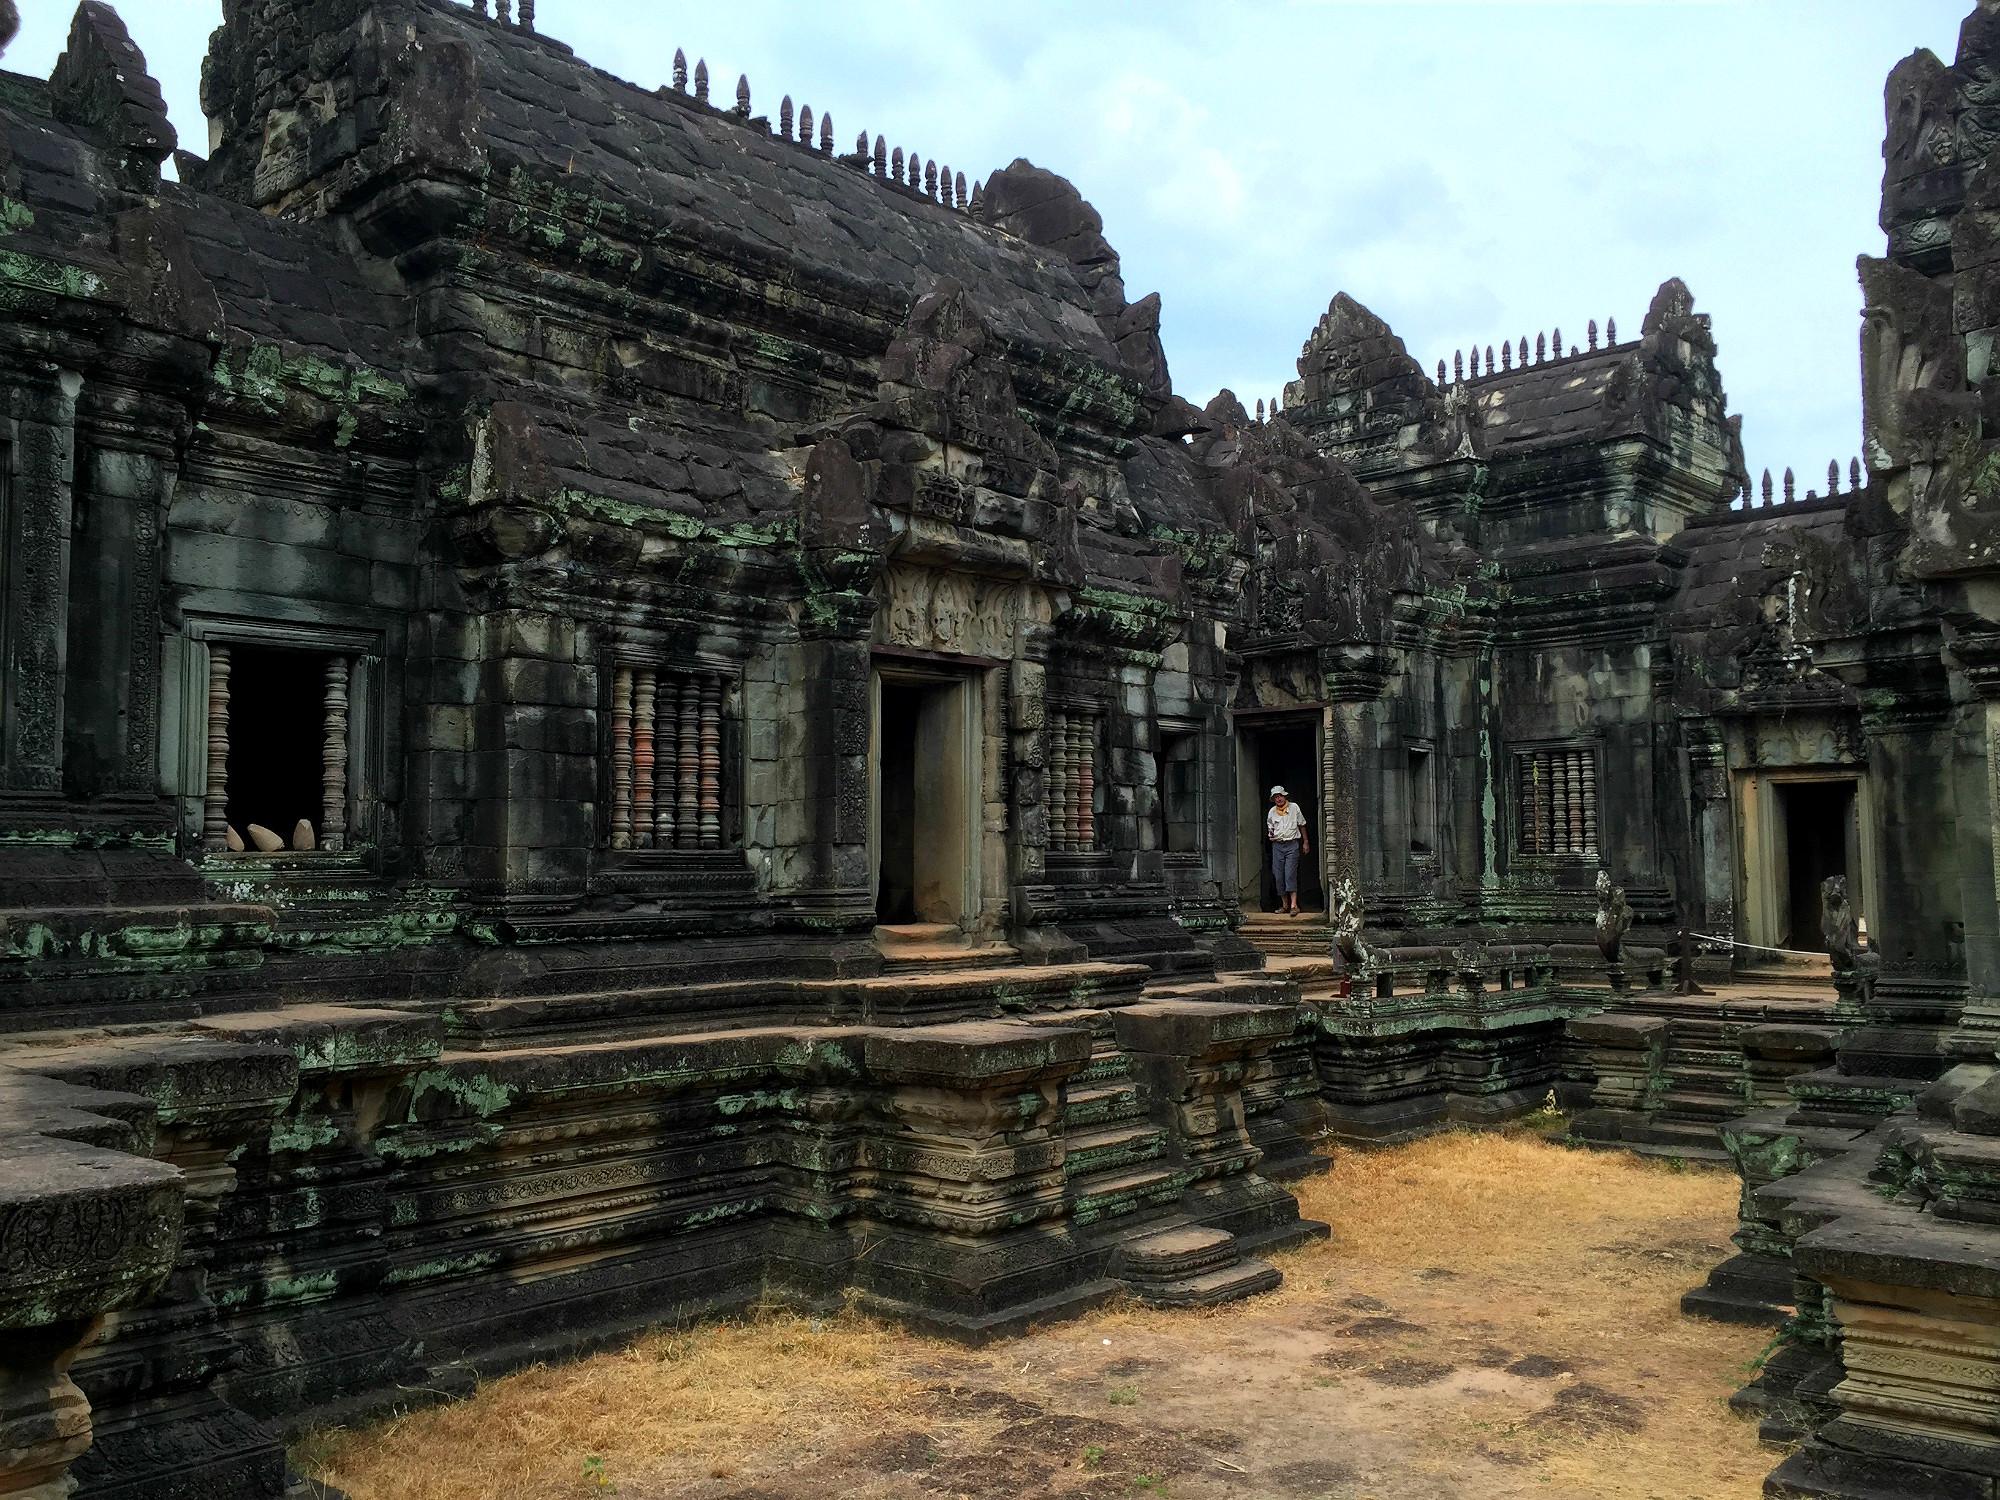 Angkor Temples Siem Reap Cambodia